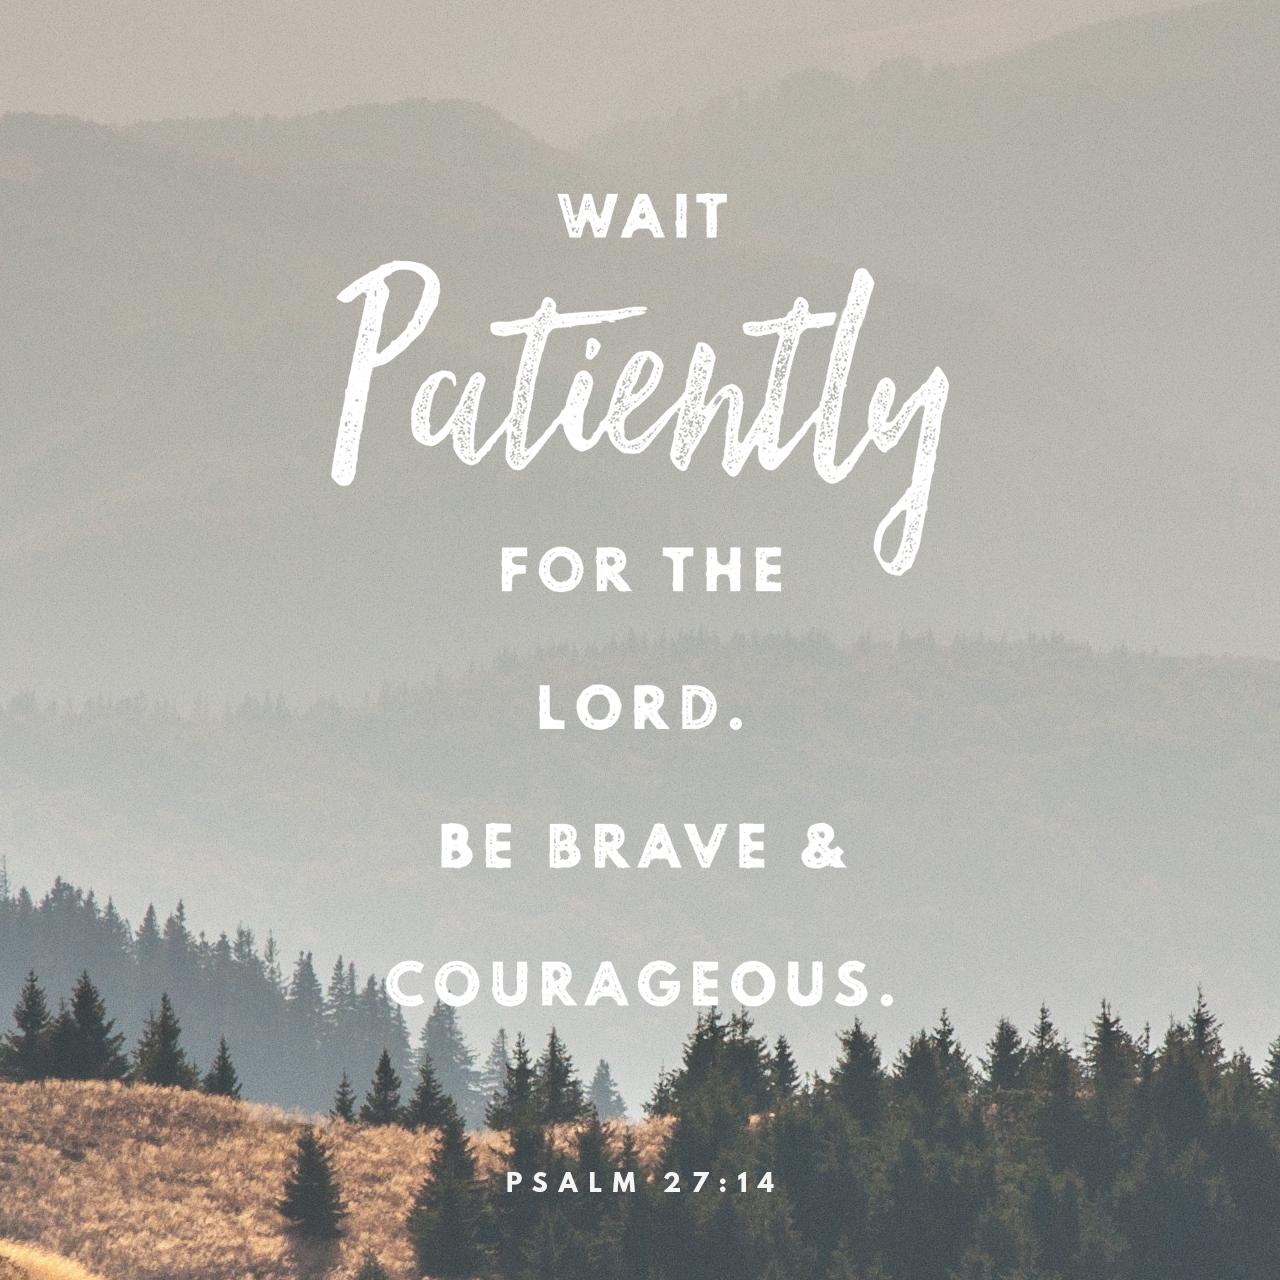 Psalms 27:14 (JPG)